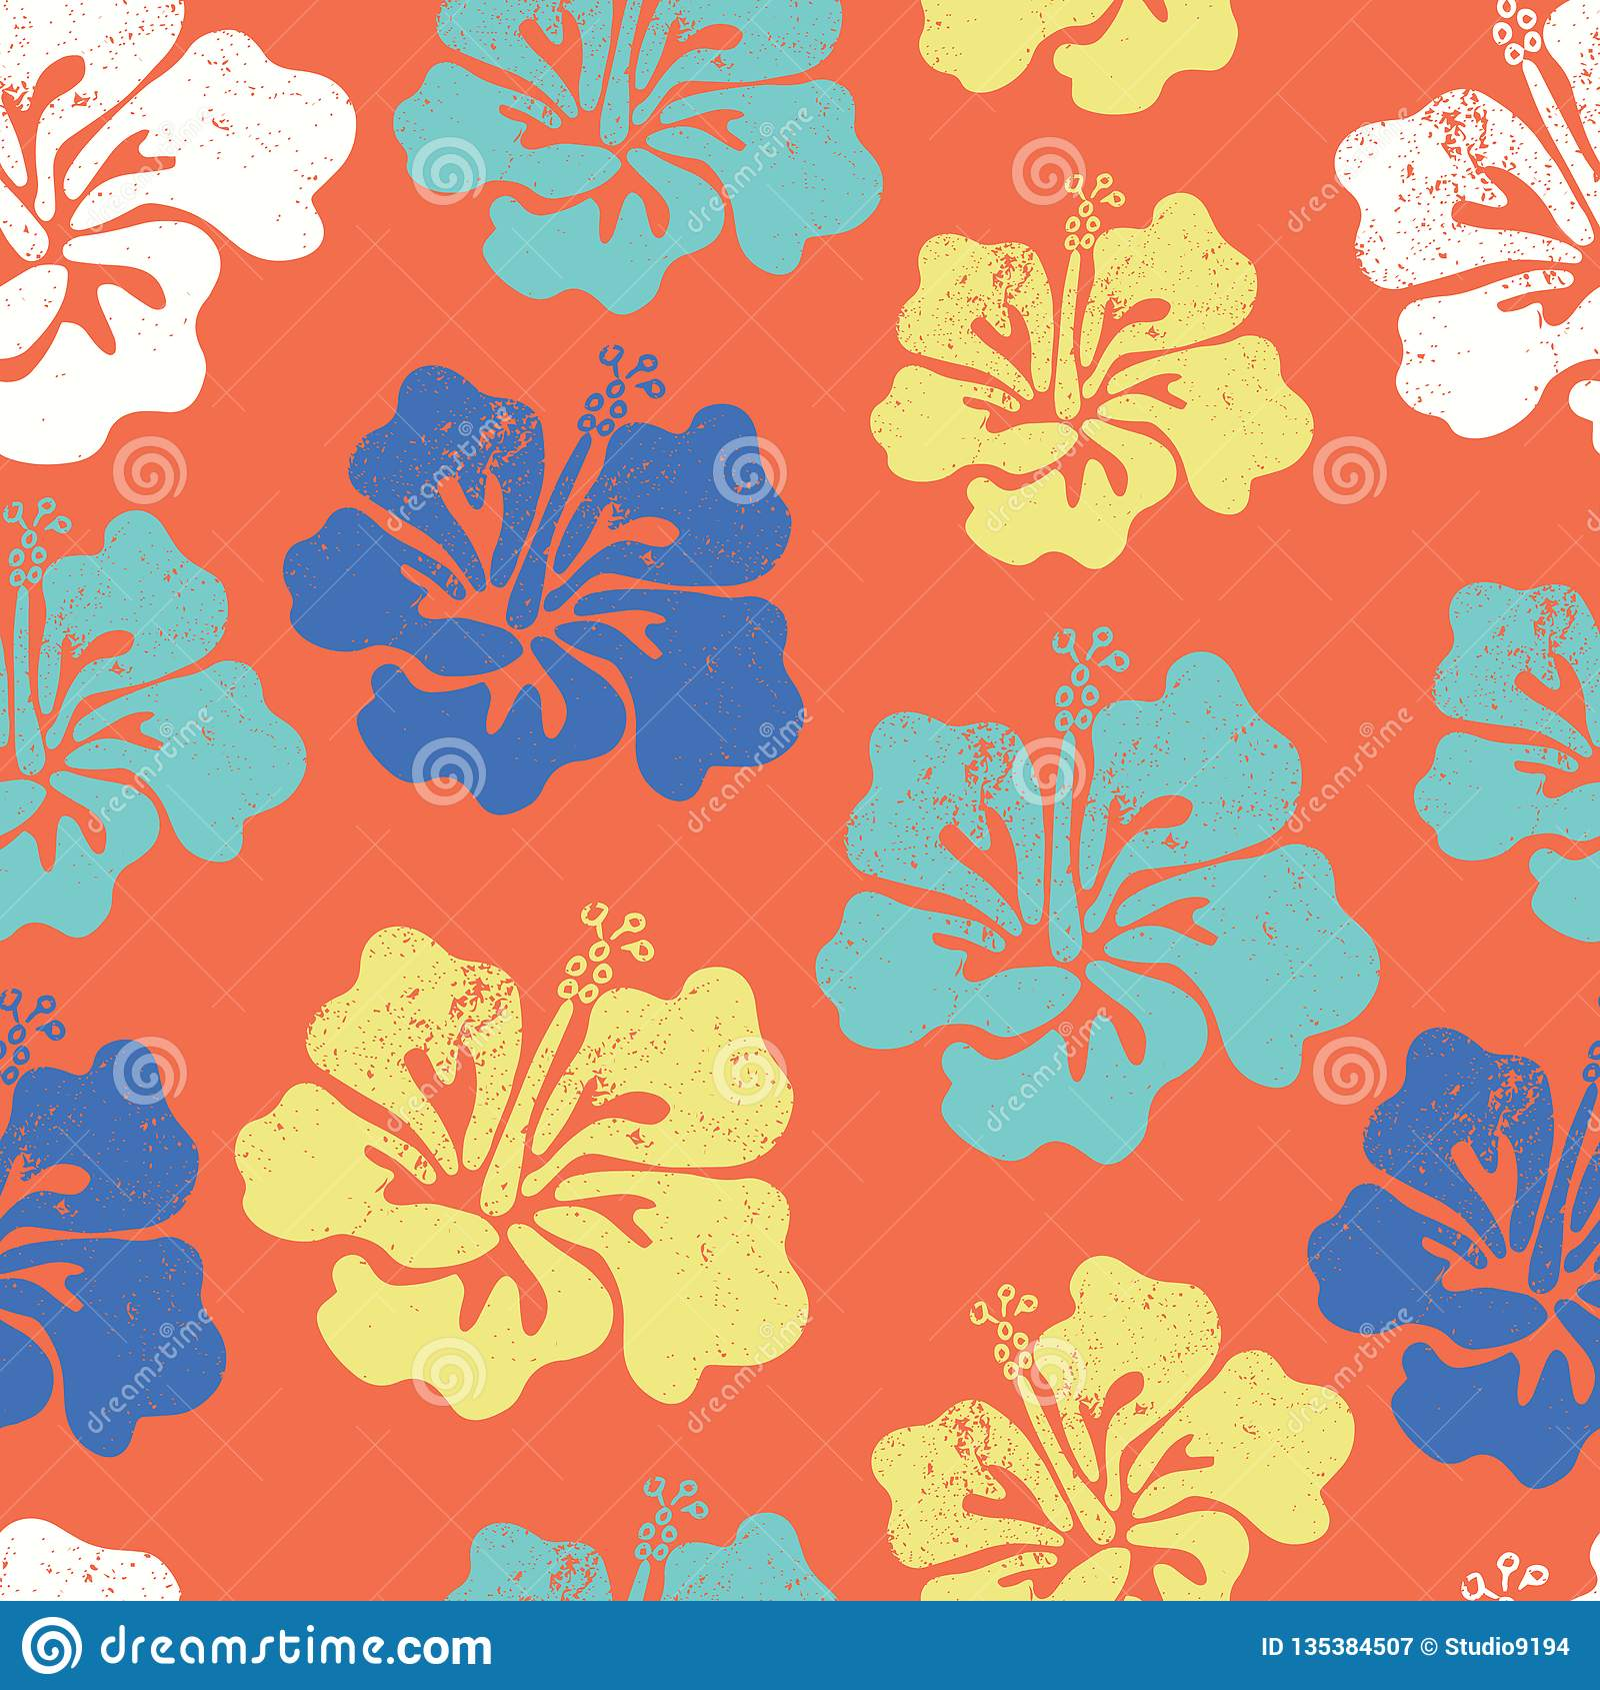 8753a5c02a23 Hibiscus flower seamless vector pattern. Aloha Hawaiian Shirt Seamless  Background Pattern. Blue orange teal